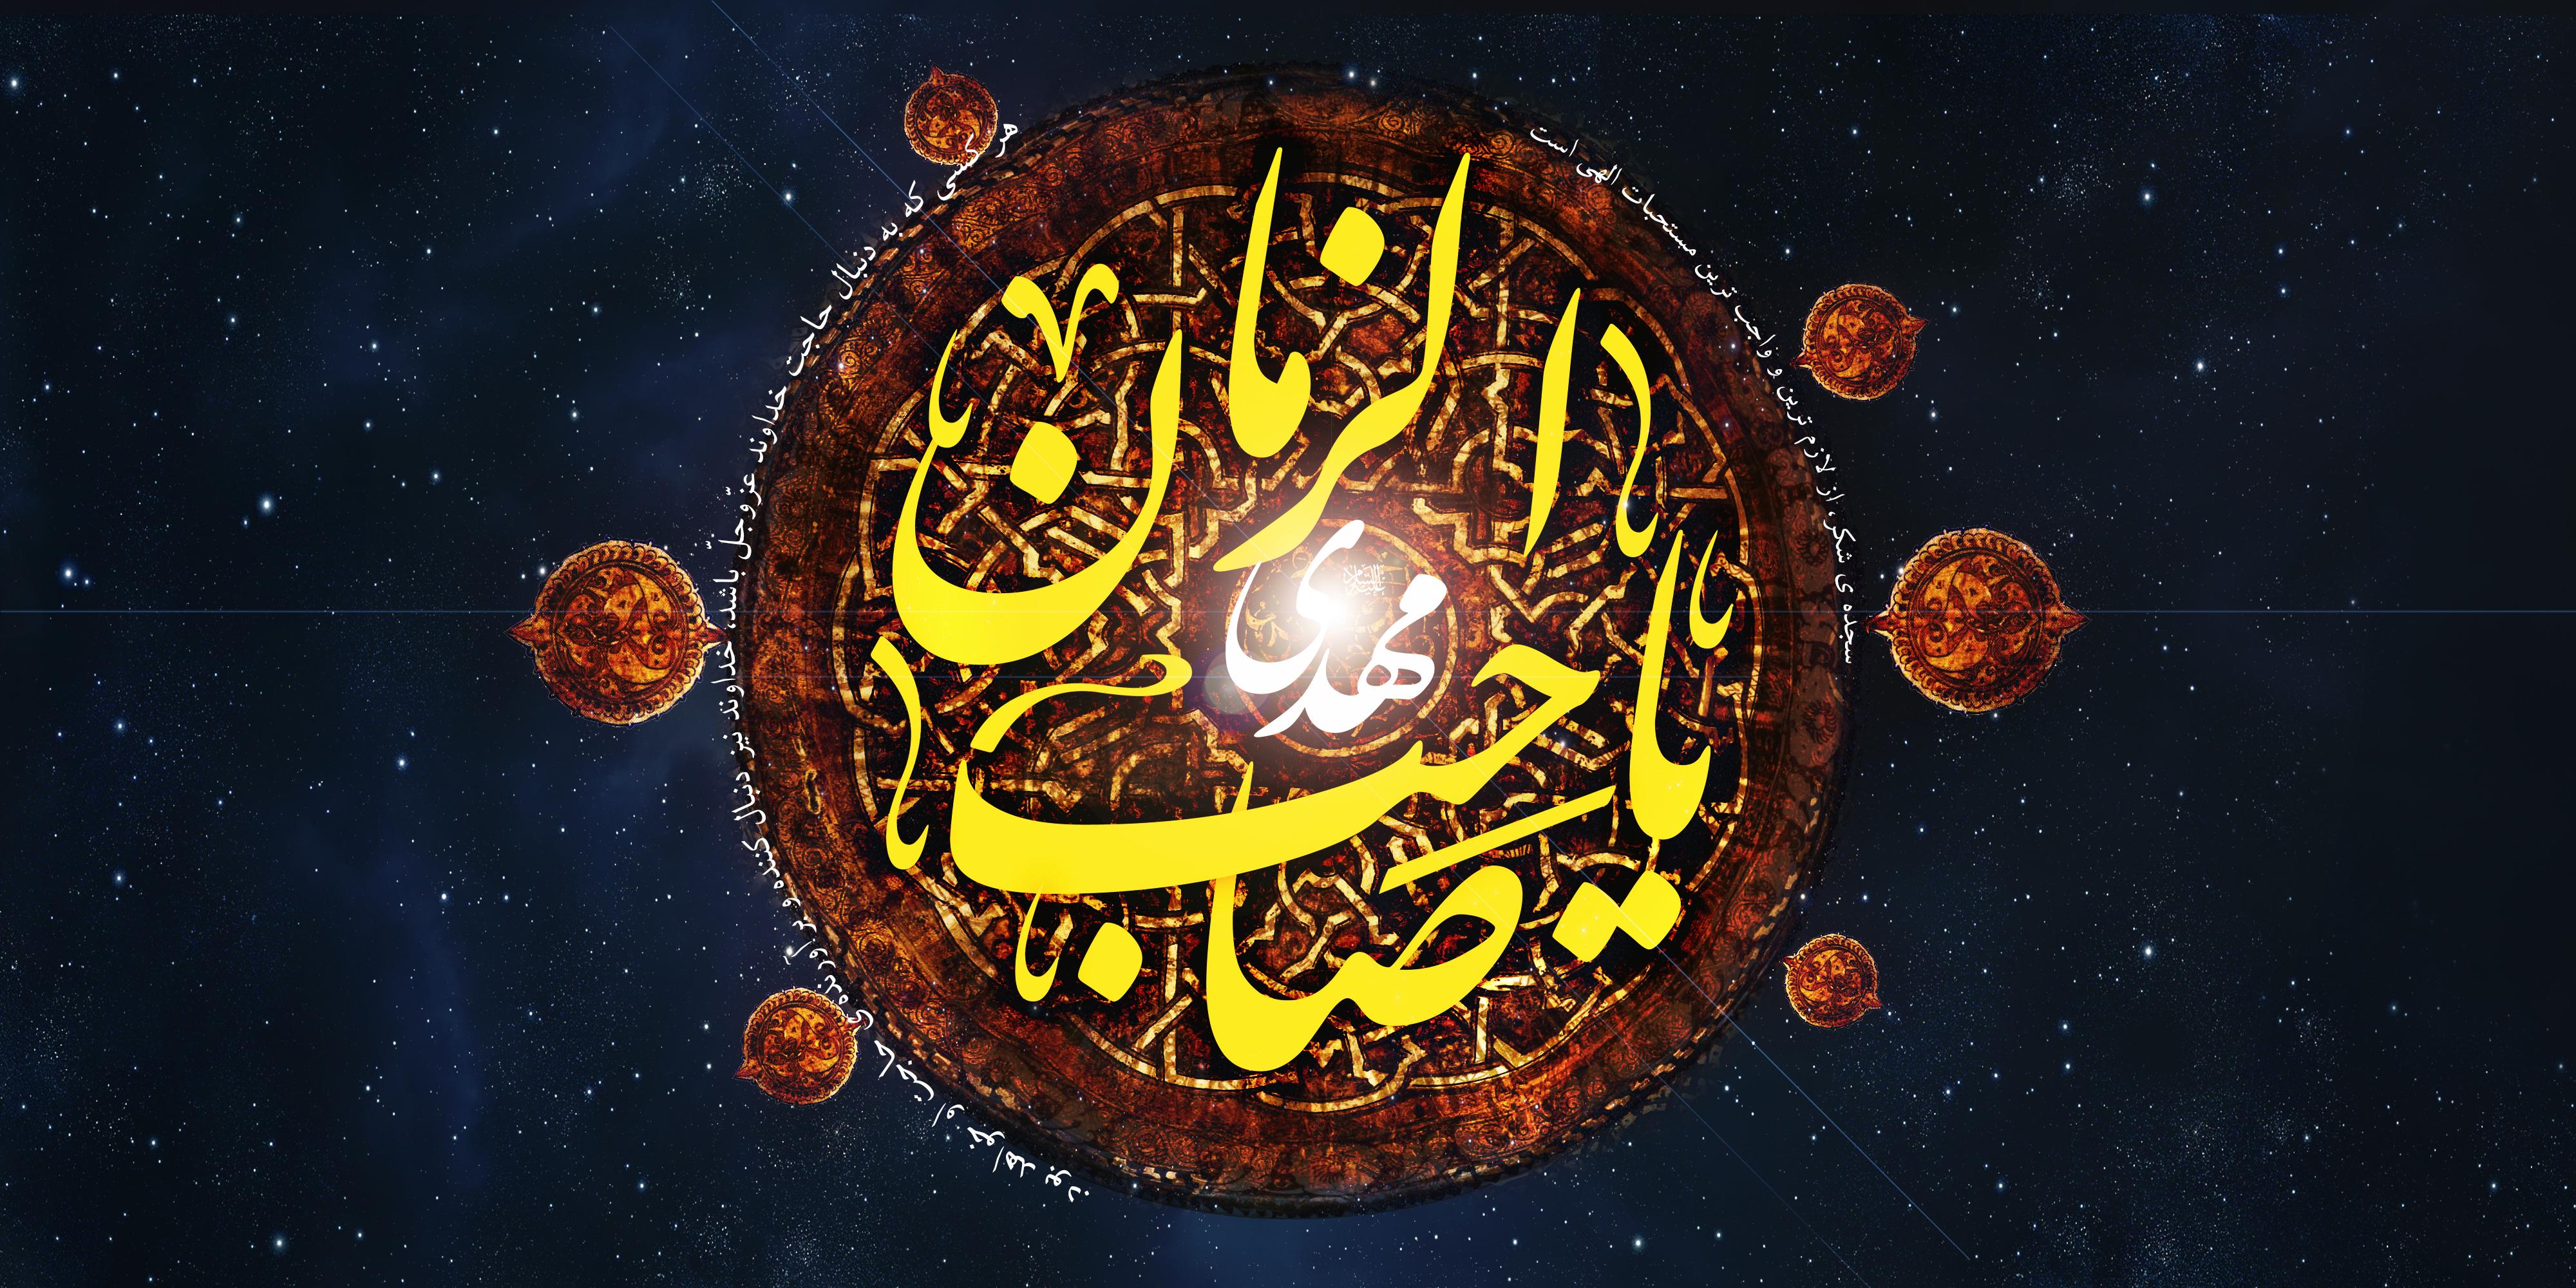 ya_imam_zaman_pbuh_by_ostadreza-d68unoo.